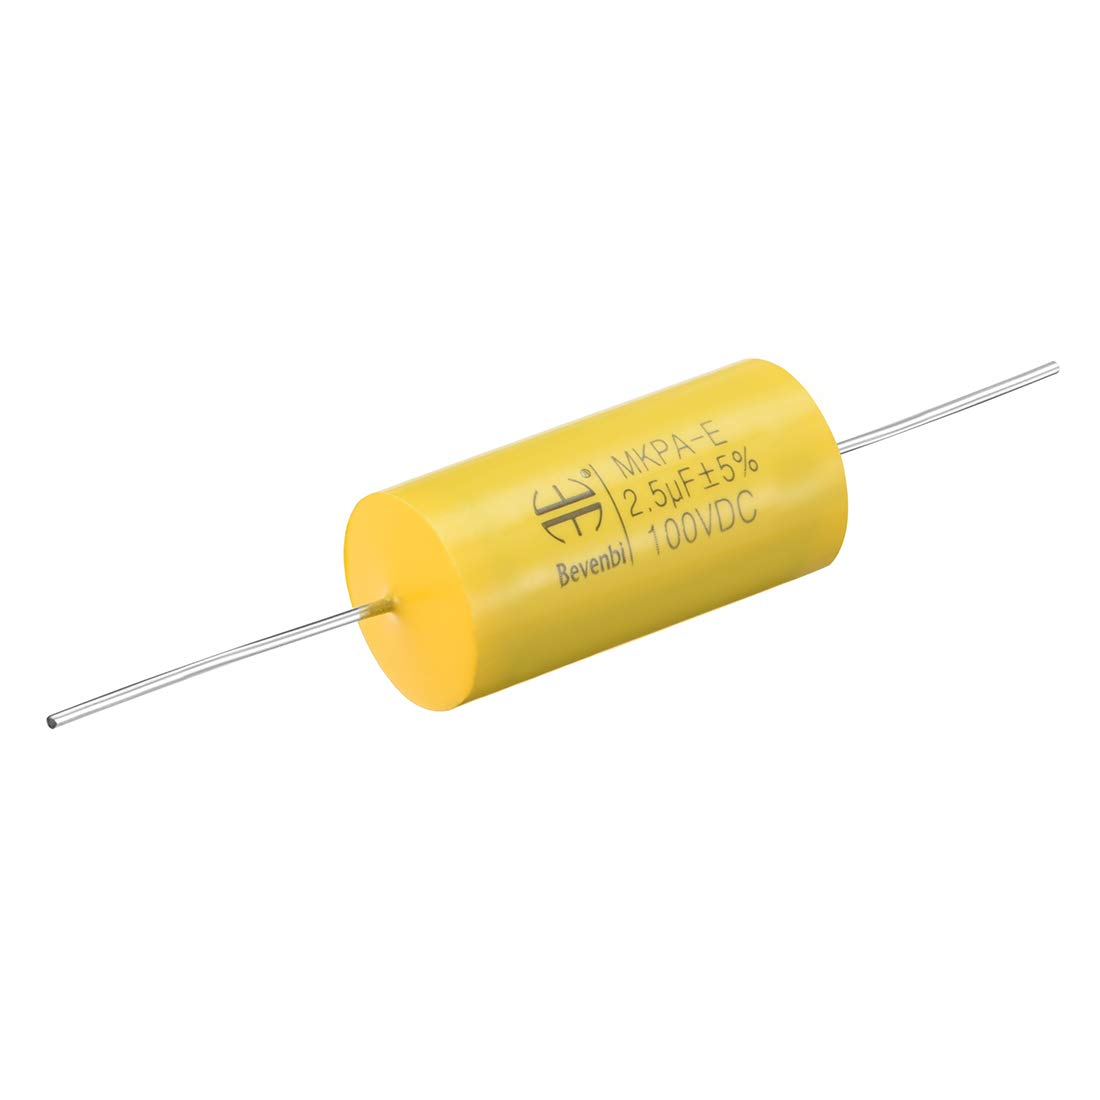 sourcing map Condensador de pel/ícula Redondo 3.0uF 100V DC Condensador de pel/ícula de Polipropileno axial para Divisor de Audio Amarillo